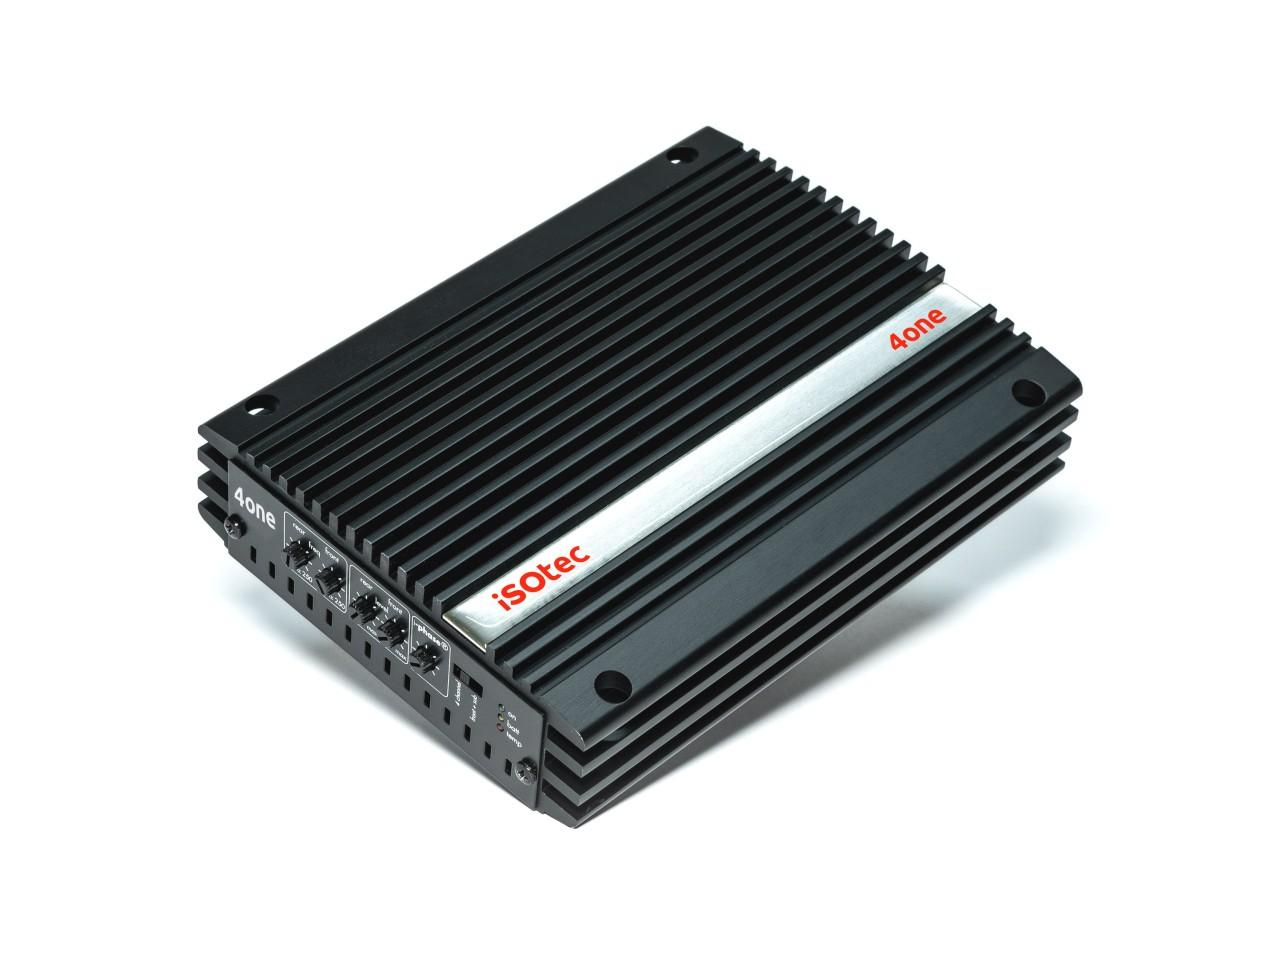 4one | Analog-Verstärker 320 Watt | plug & play